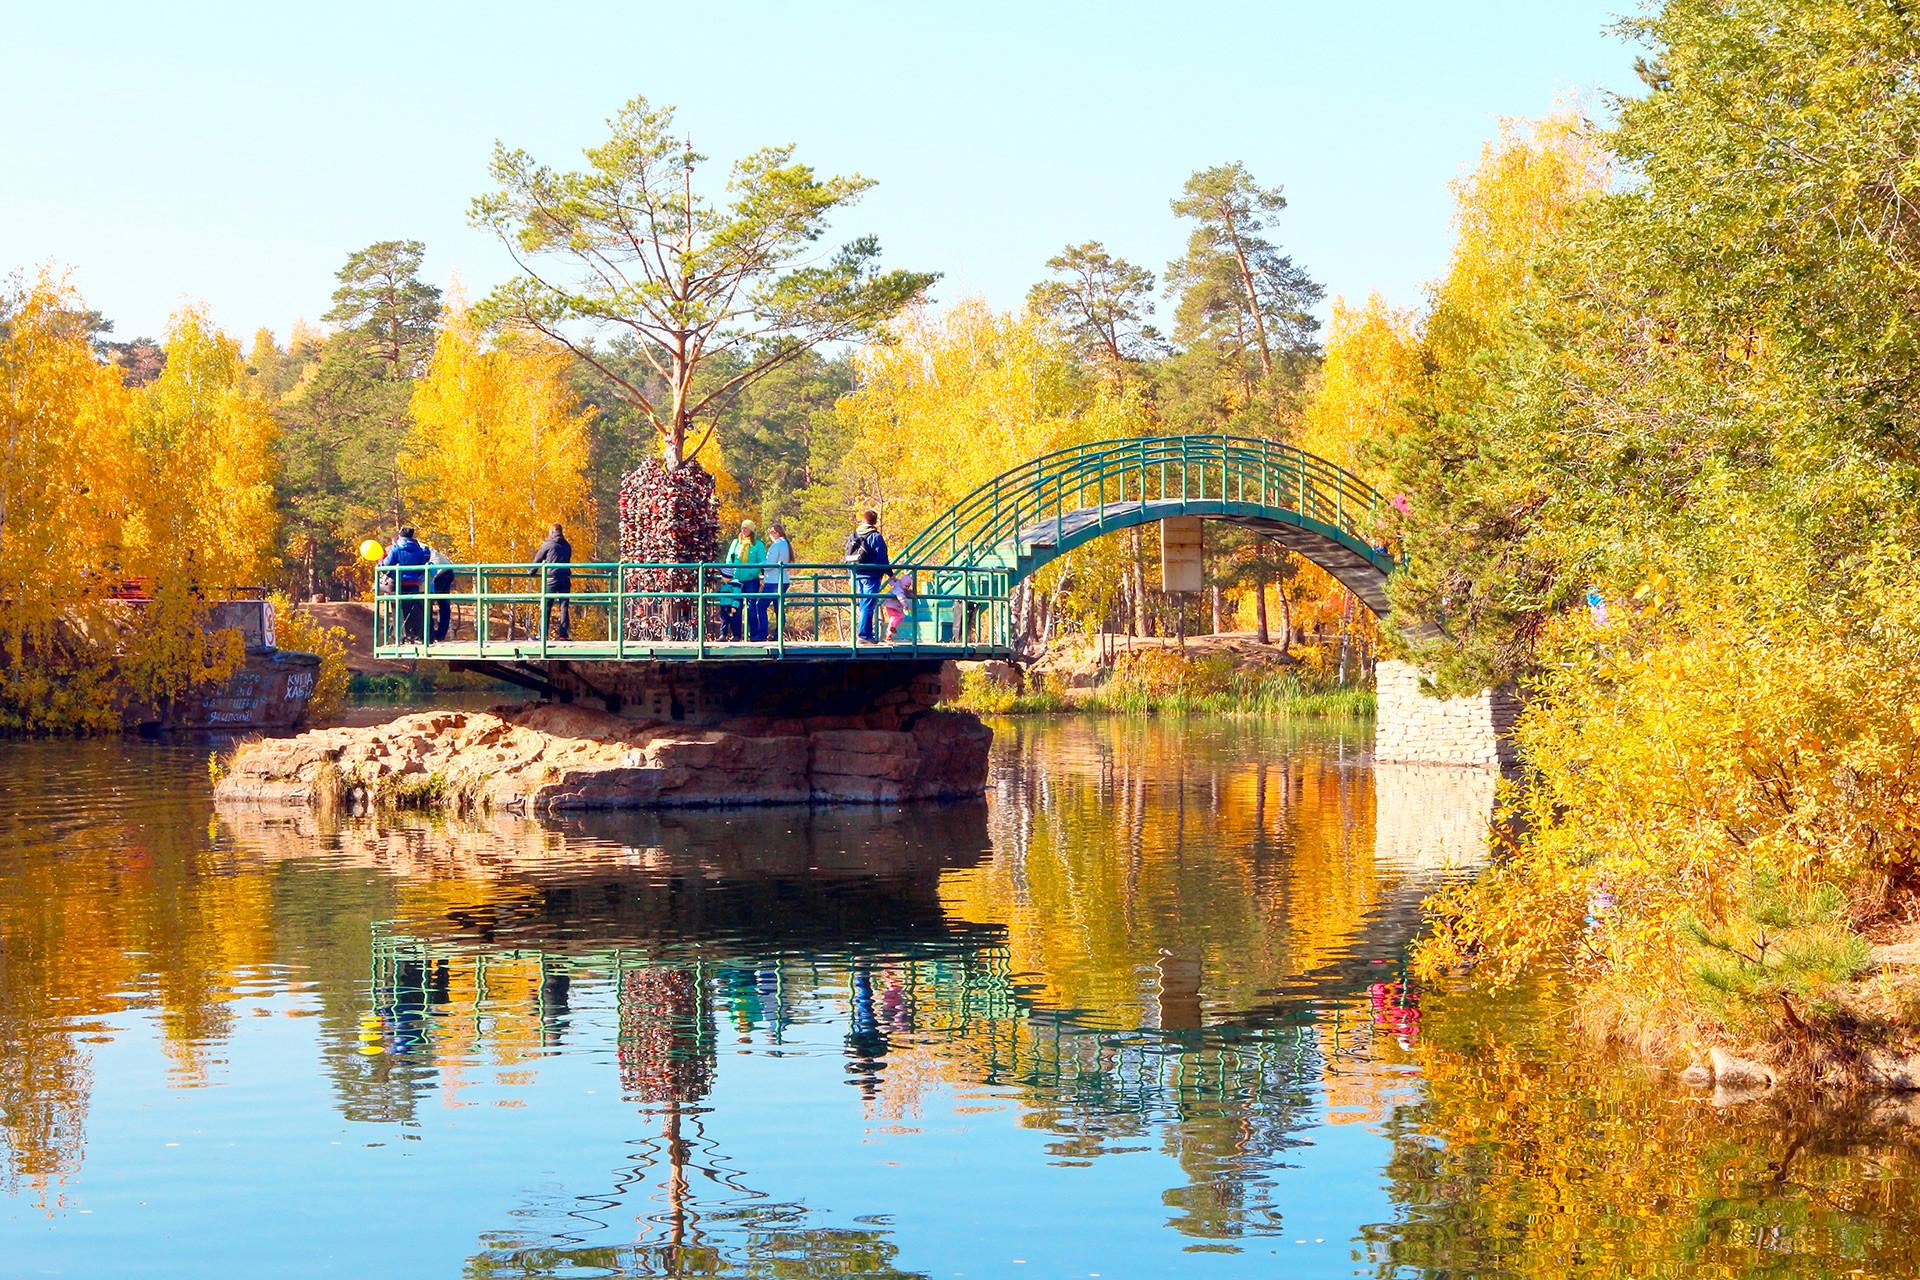 Herbst im Tscheljabinsker Gagarin-Park